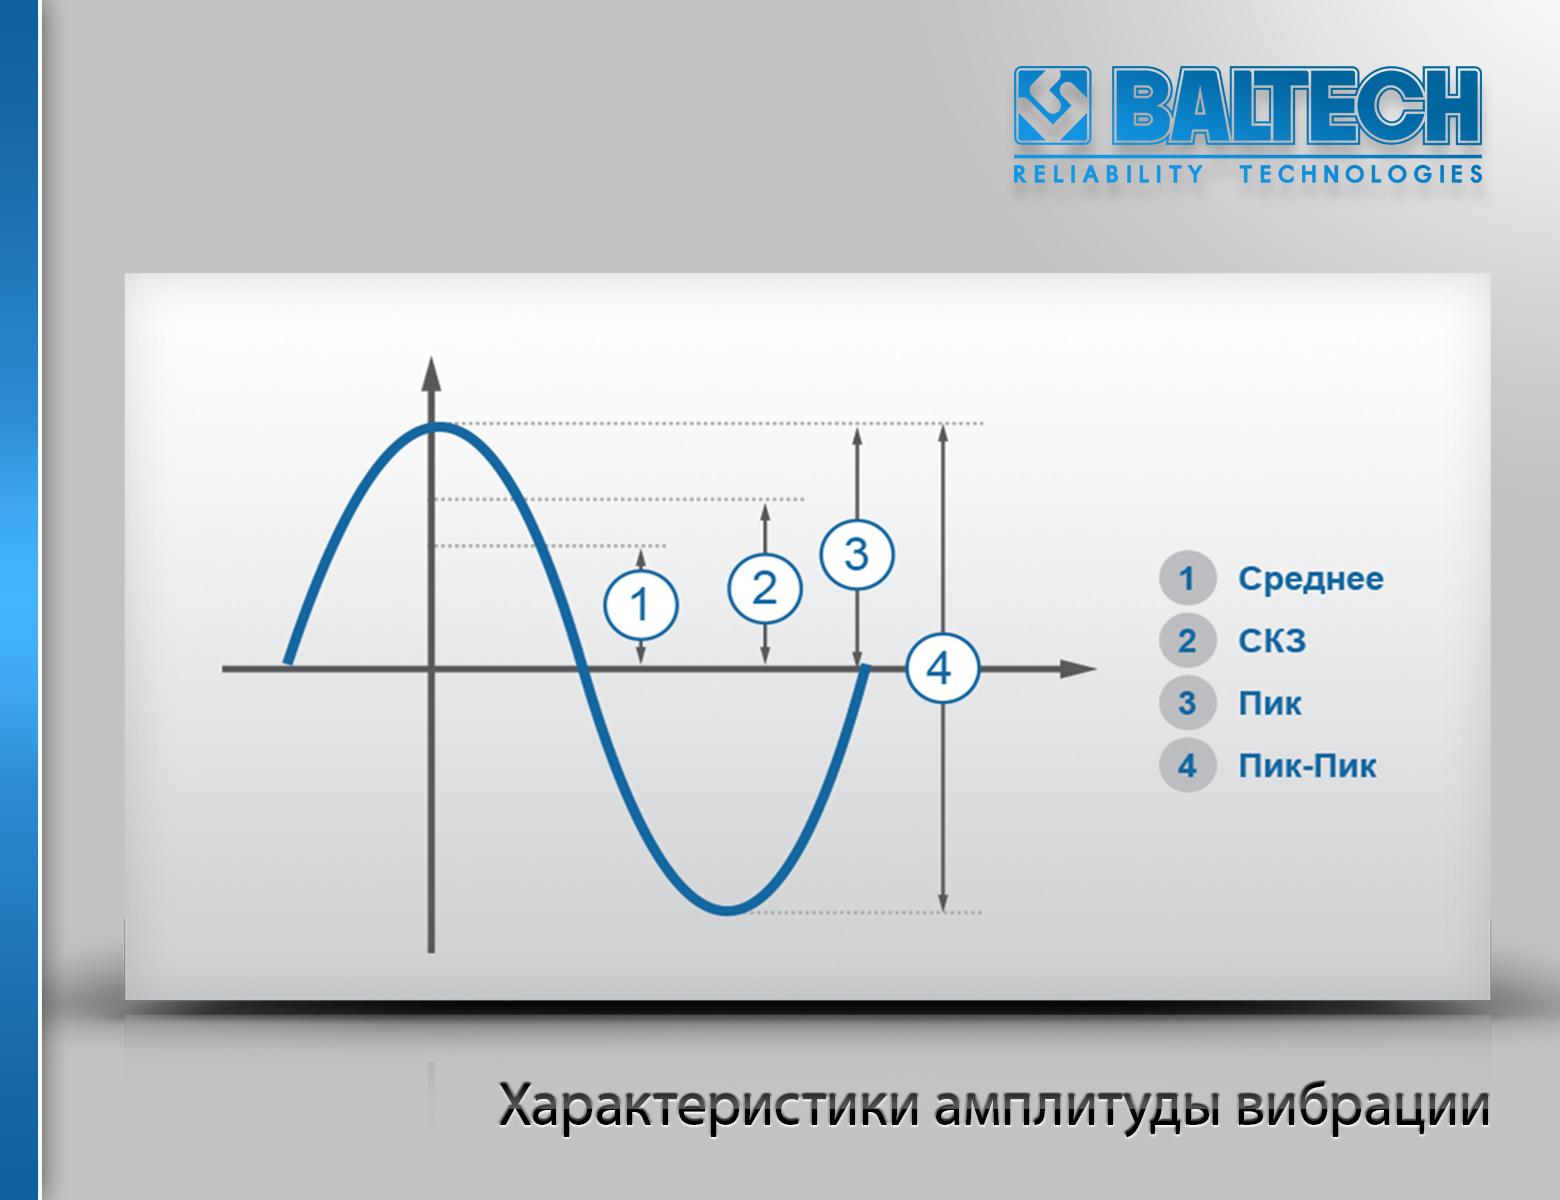 Характеристики амплитуды вибрации, среднее значение, среднеквадратичное значение, размах вибрации